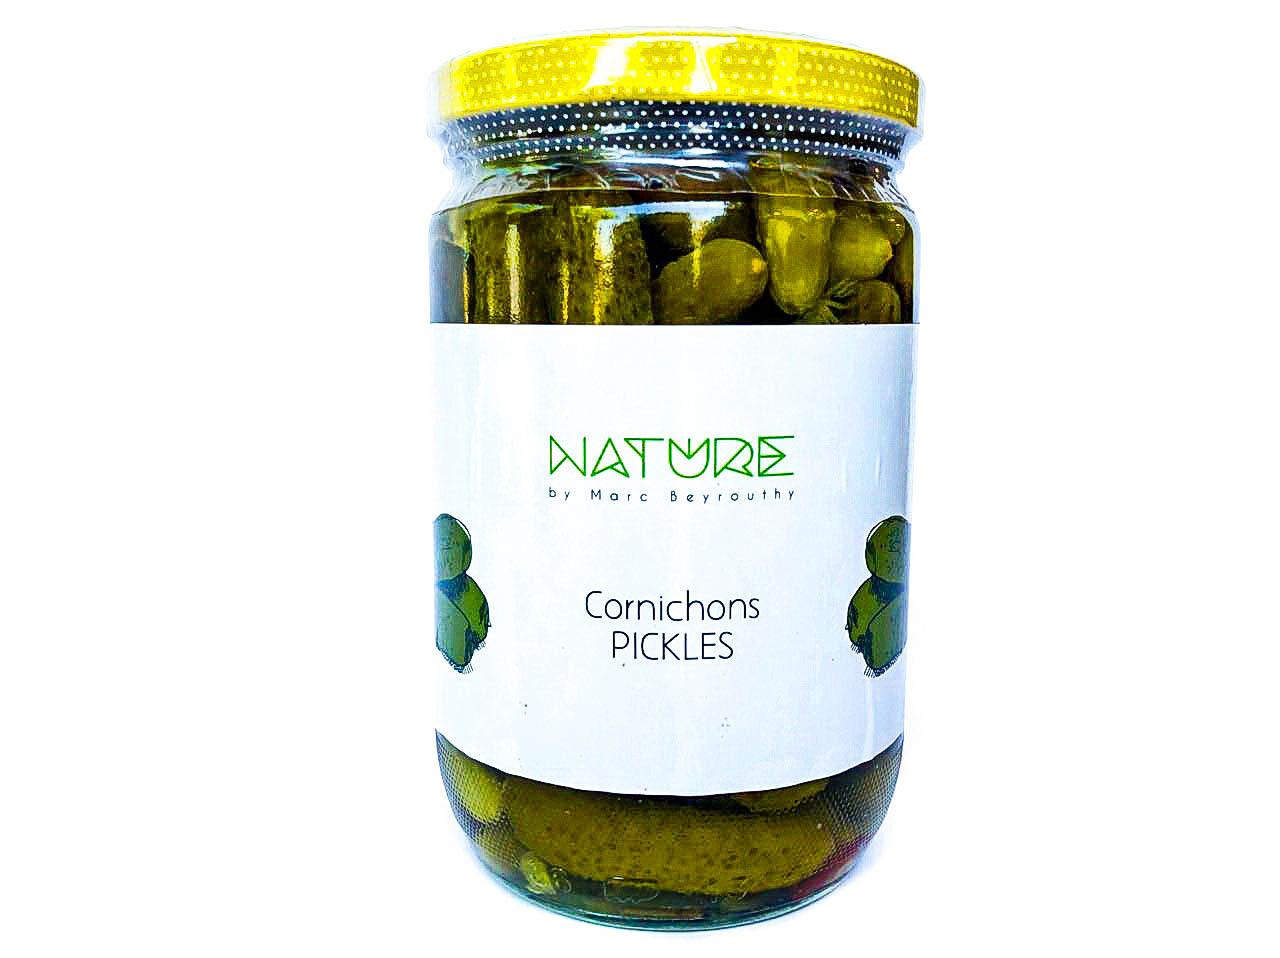 Cornichon Pickles كبيس كورنيشون (Jar) - Nature by Marc Beyrouthy